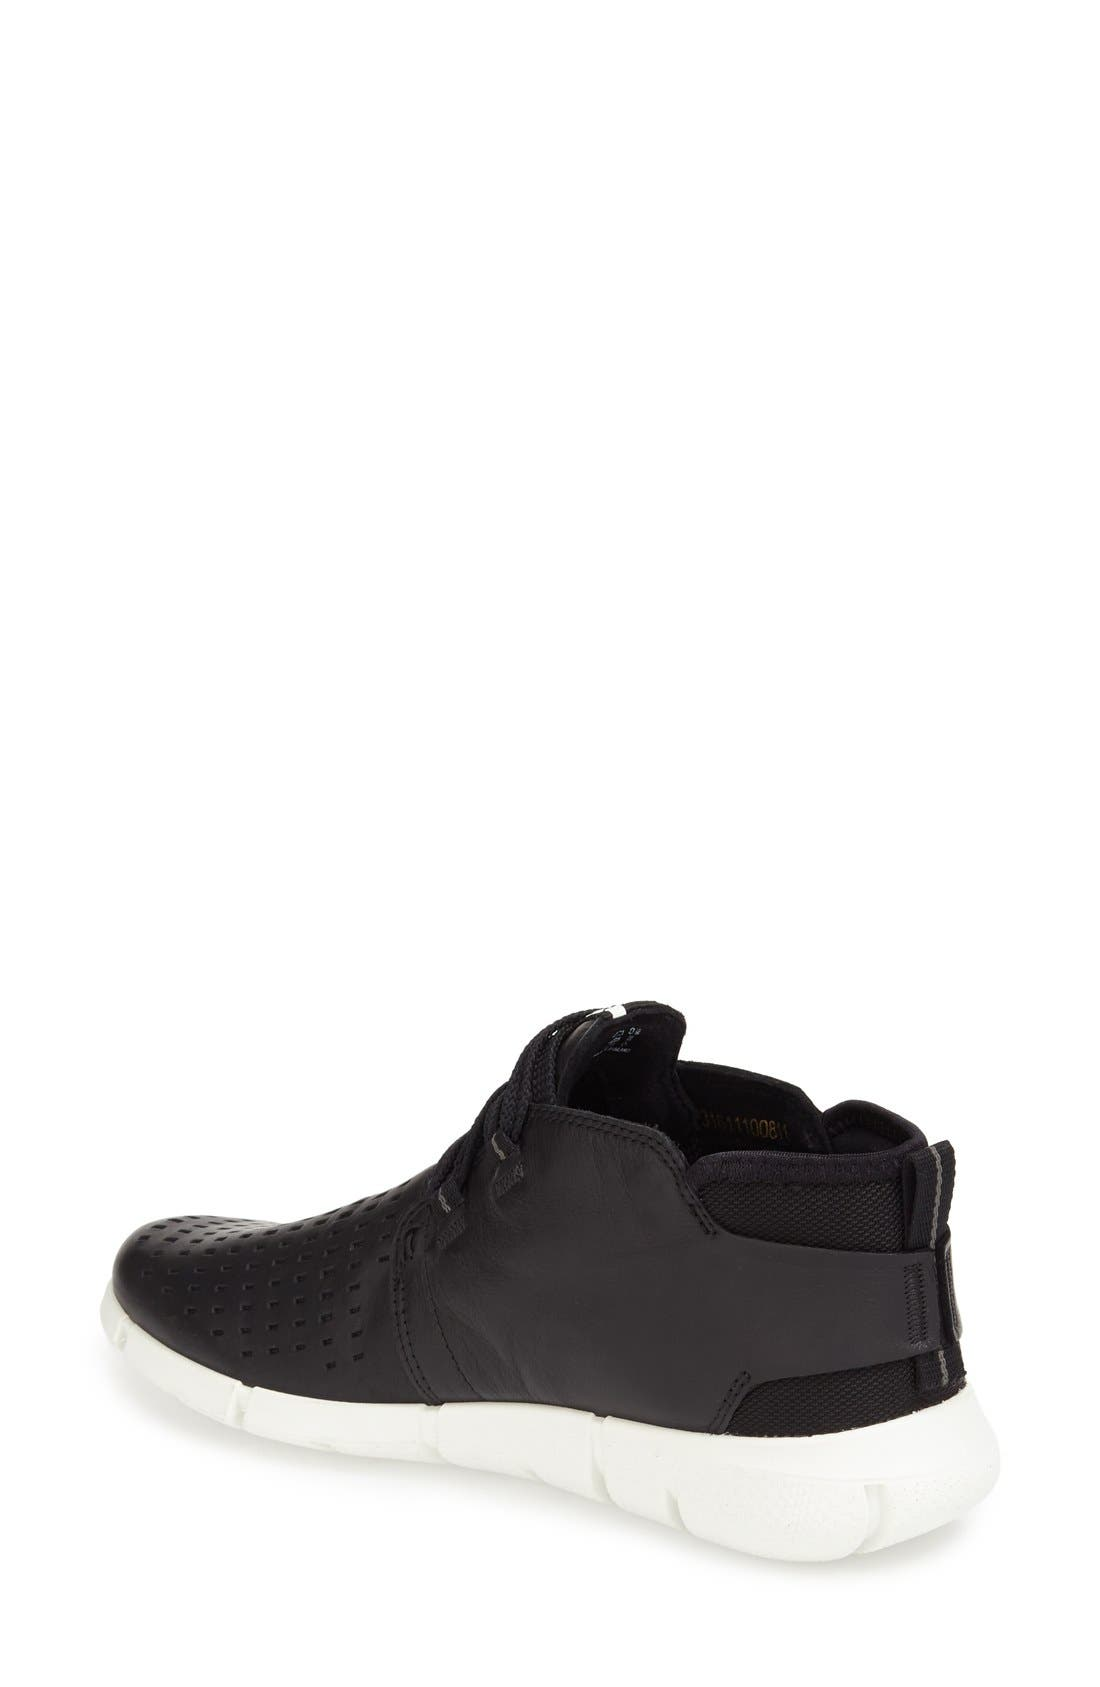 Alternate Image 2  - ECCO 'Intrinsic' Chukka Sneaker (Women)